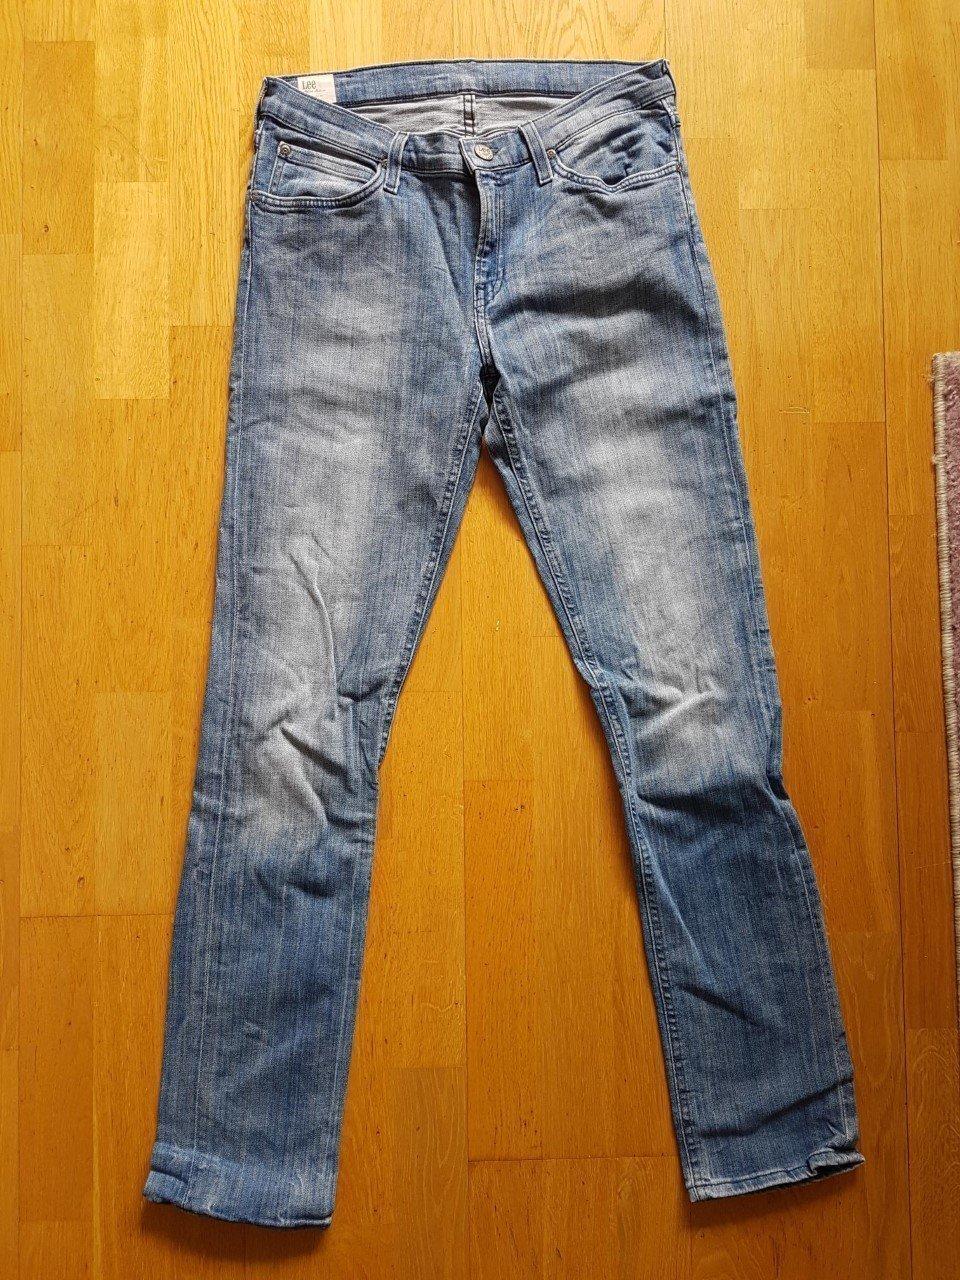 lee jeans storlekar